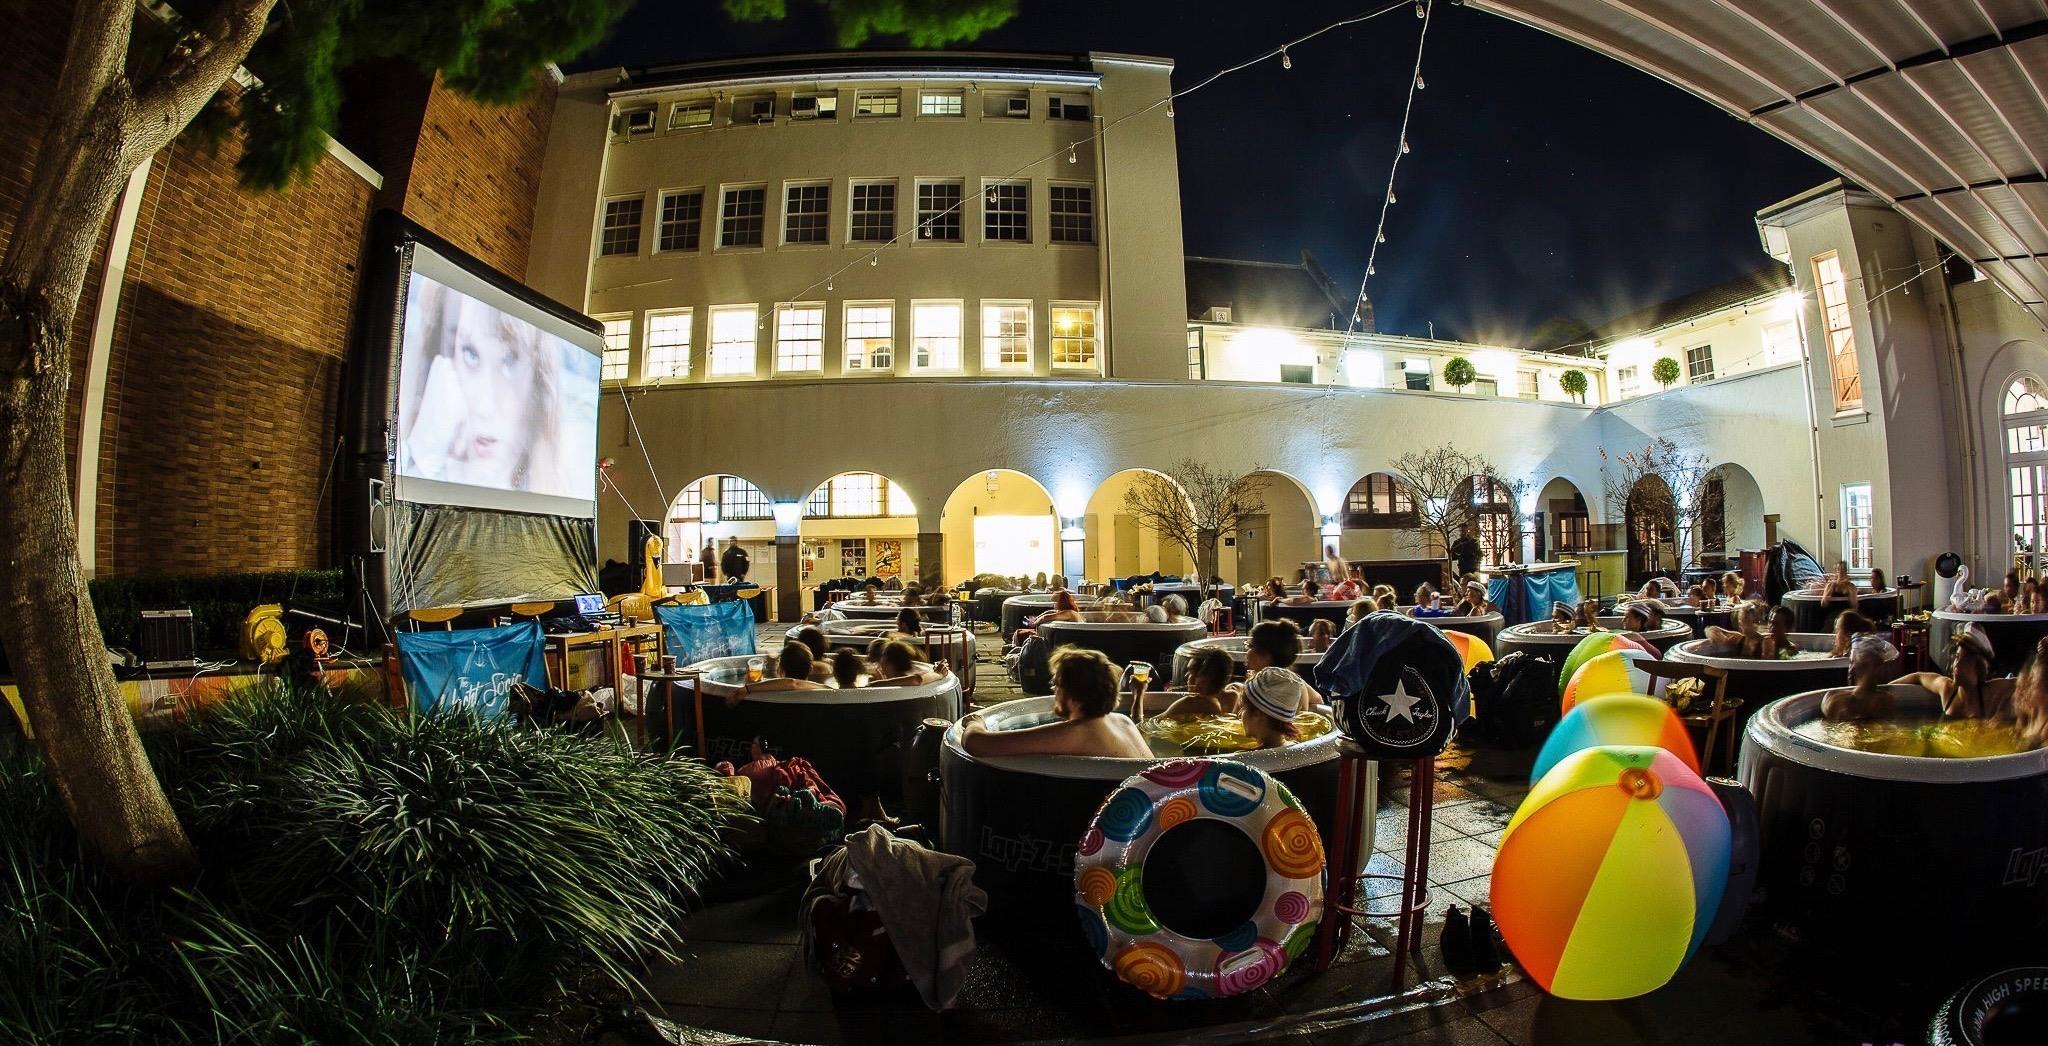 Hot tub movie nights 1